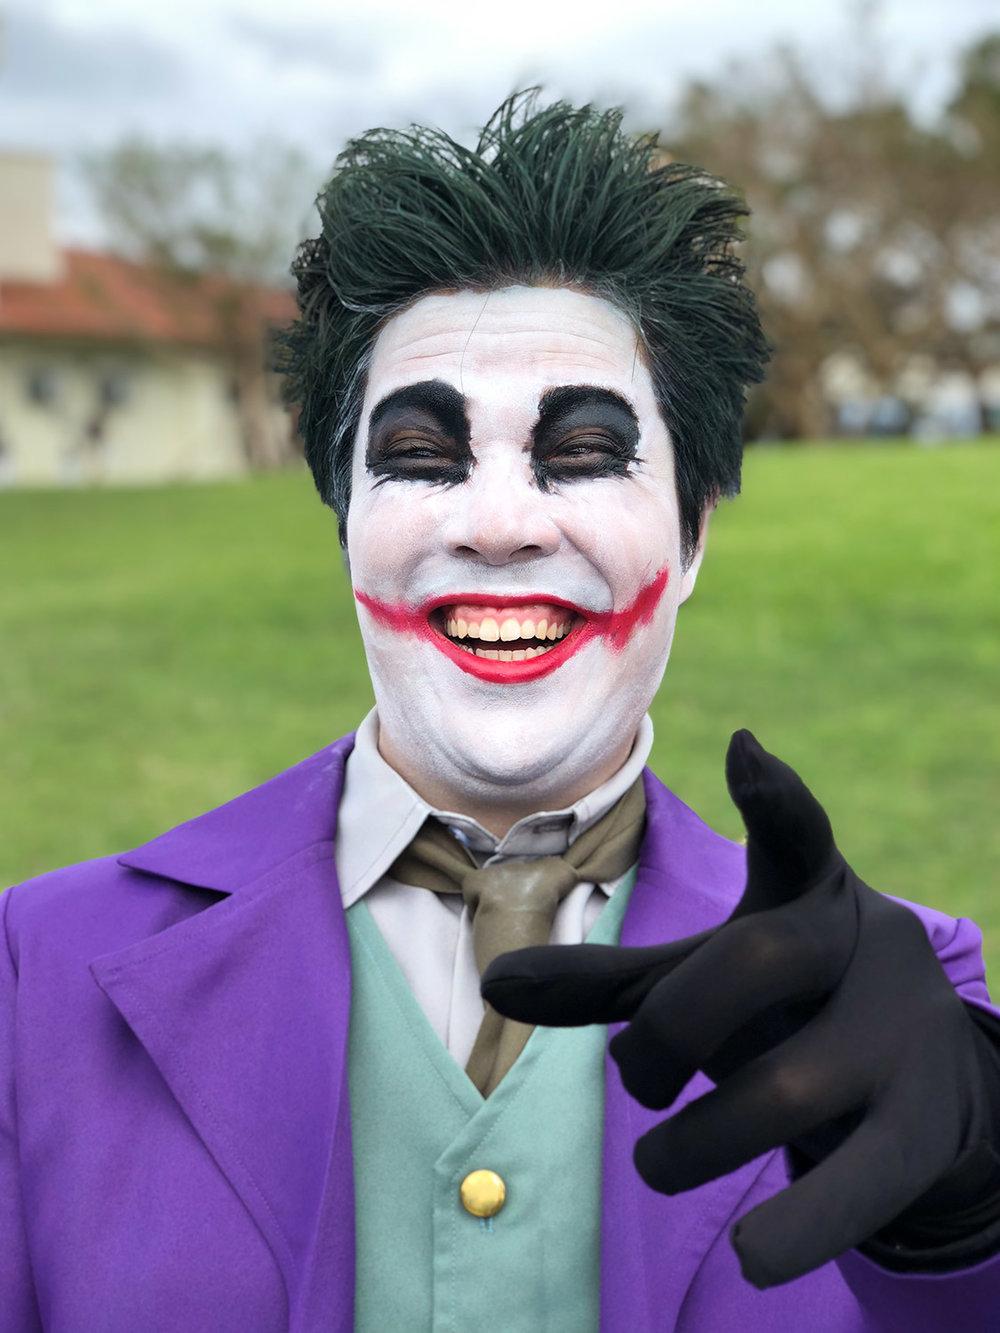 Joker #ShotOniPhone #ShotOniPhoneX using portrait mode.